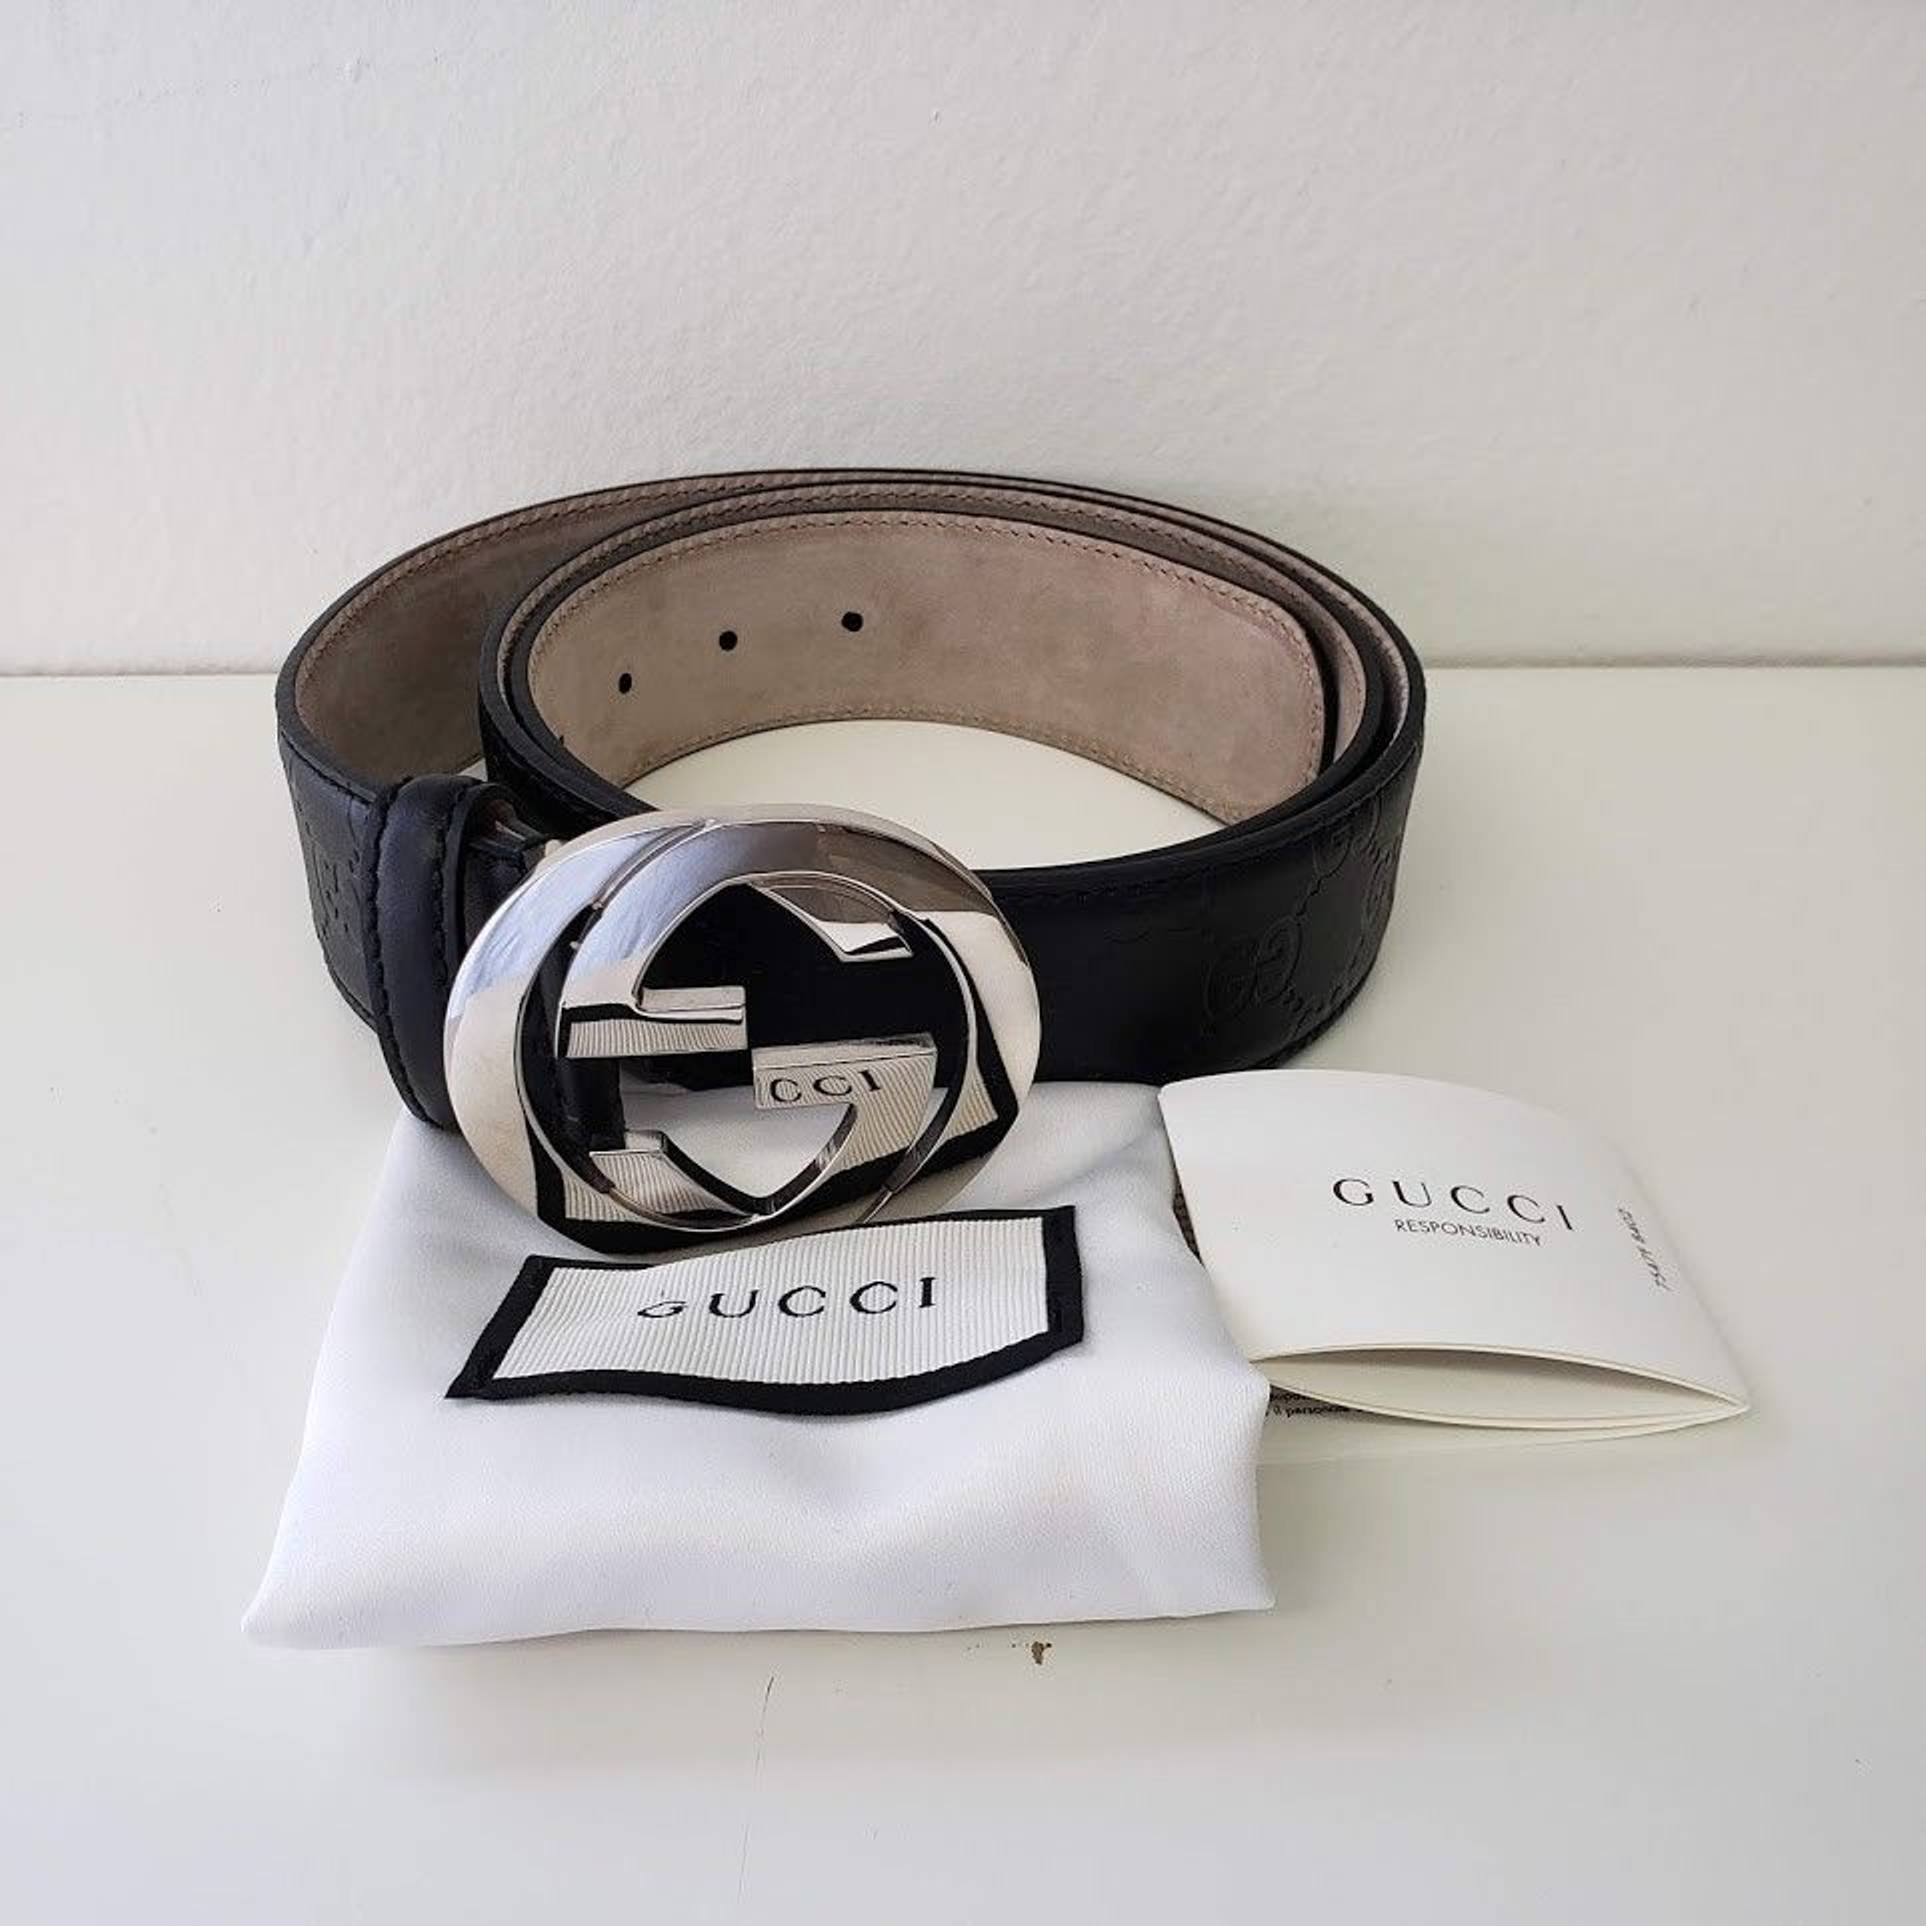 4a511167a68 Gucci ×. Gucci Interlocking GG Monogrammed Guccissima Unisex Leather Belt -  Black